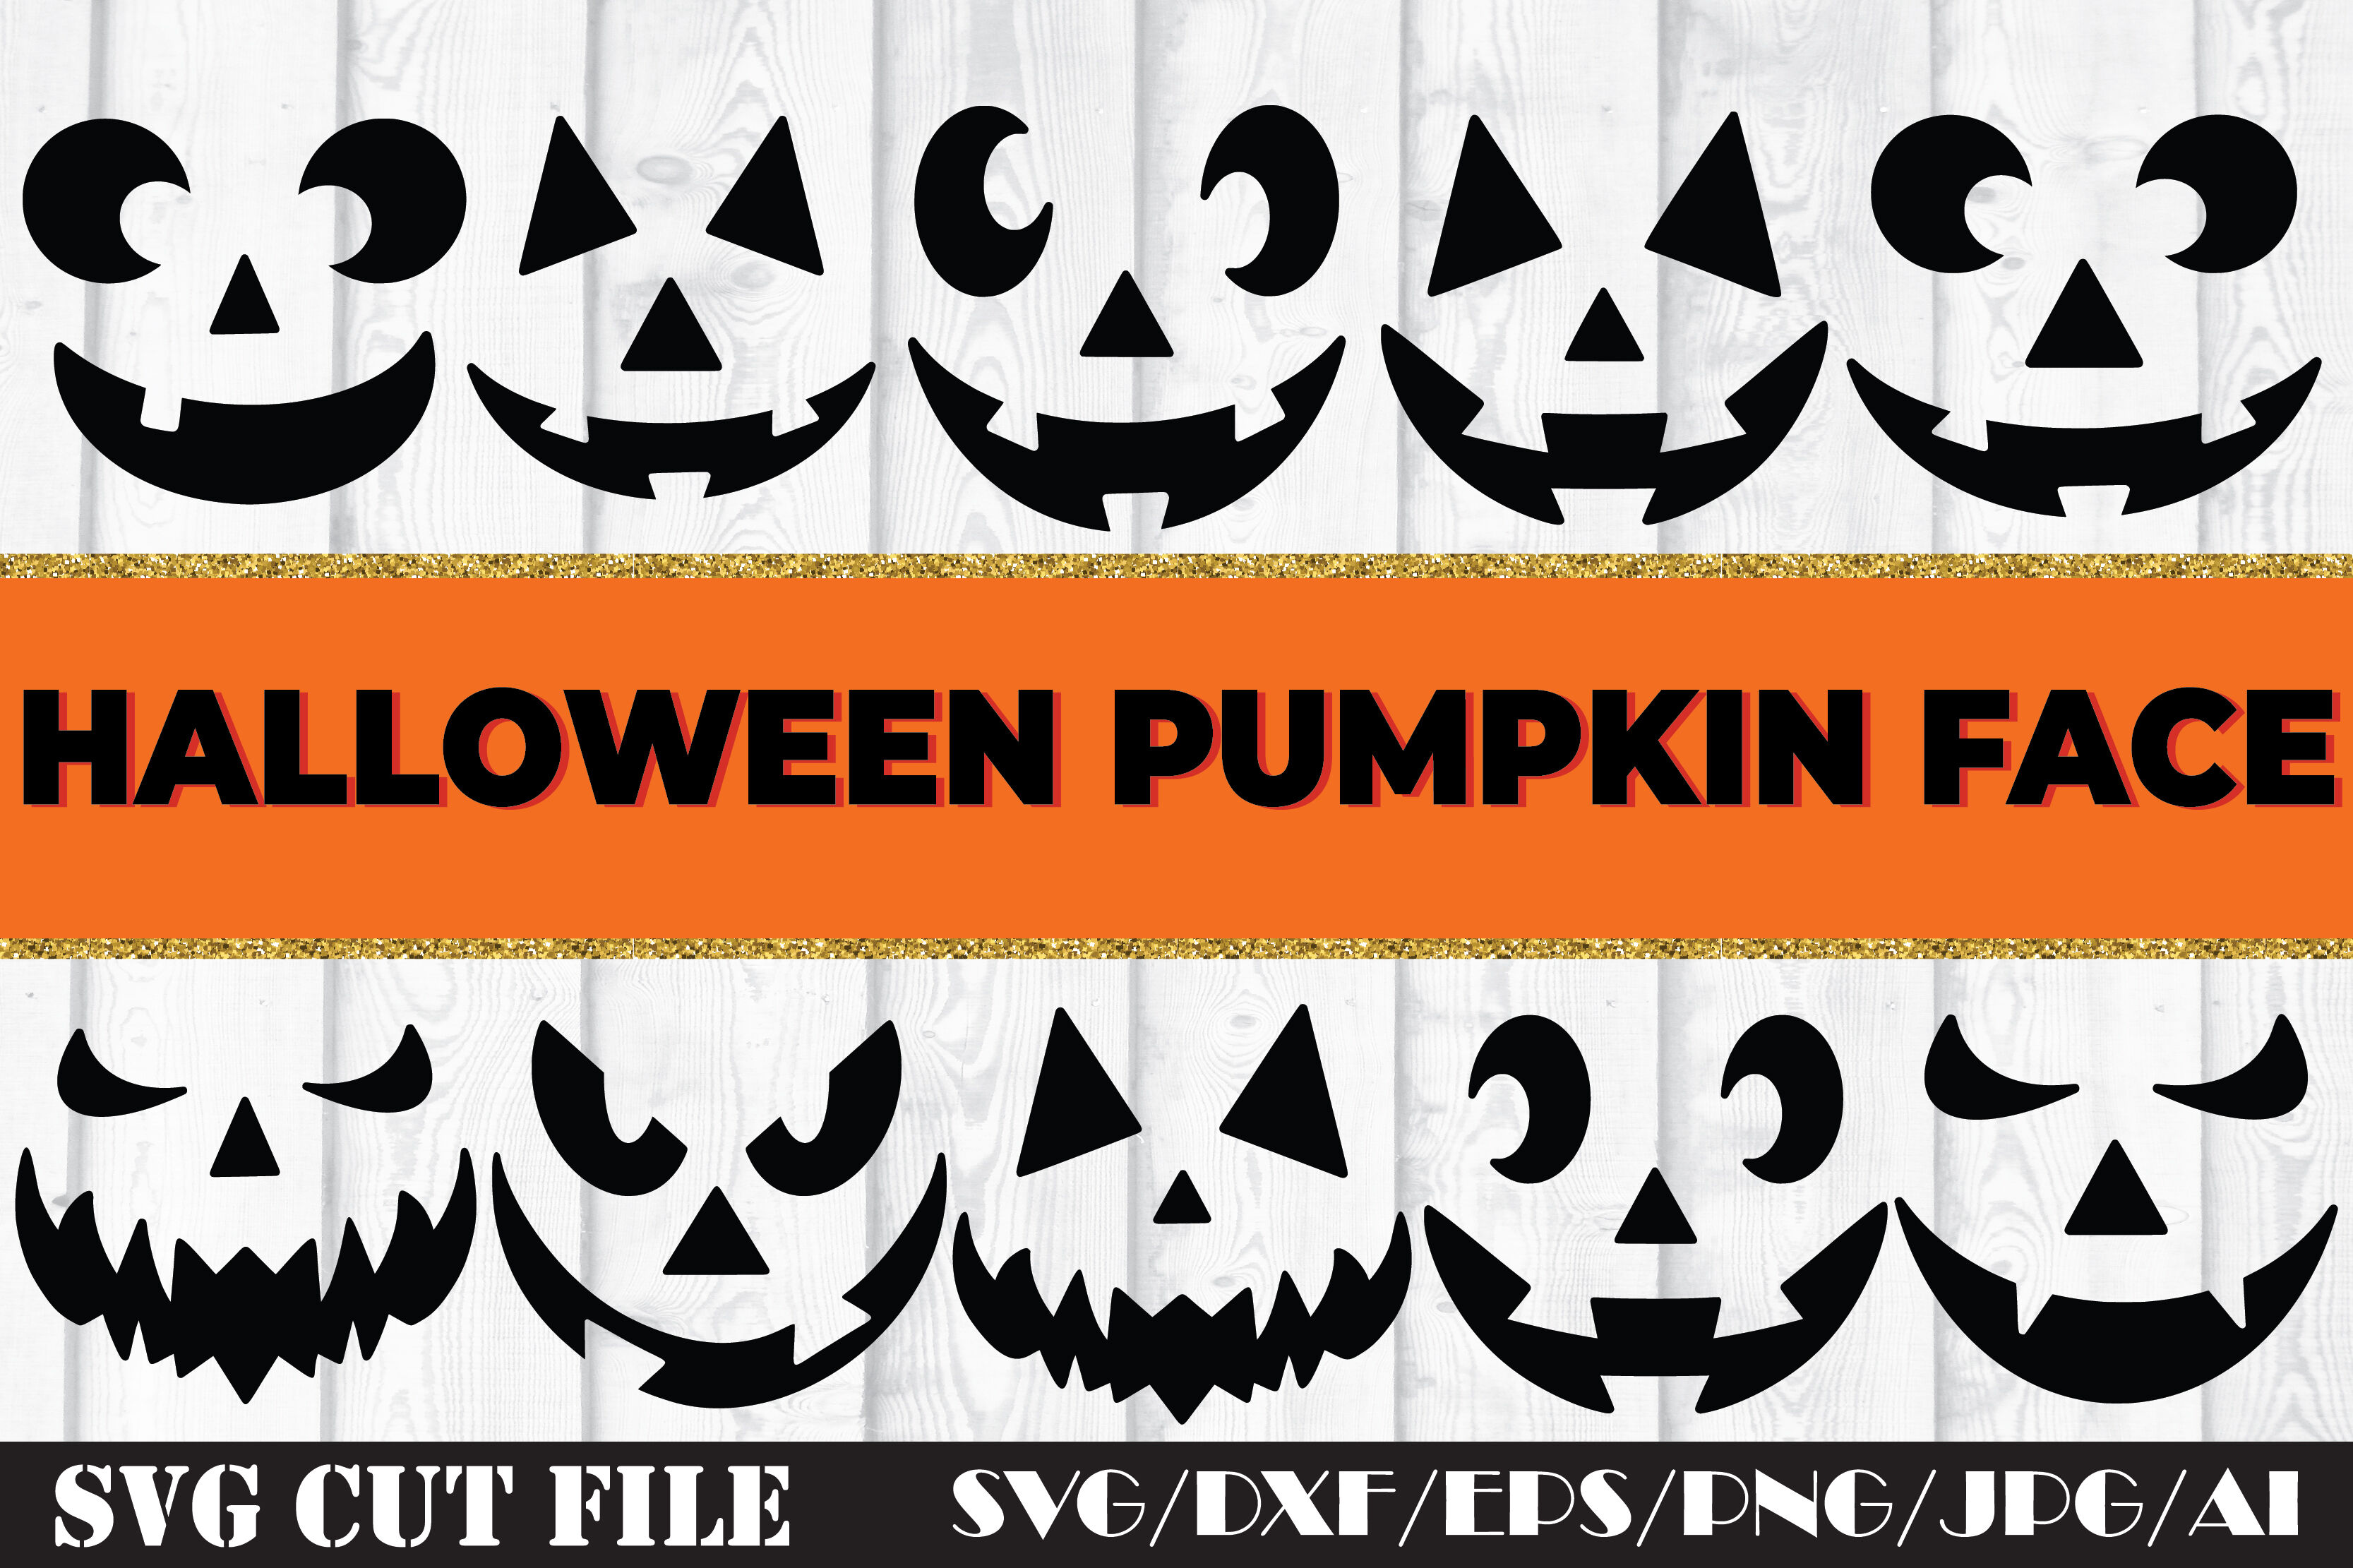 Halloween Pumpkin Face Svg Cut File By Svgsupply Thehungryjpeg Com